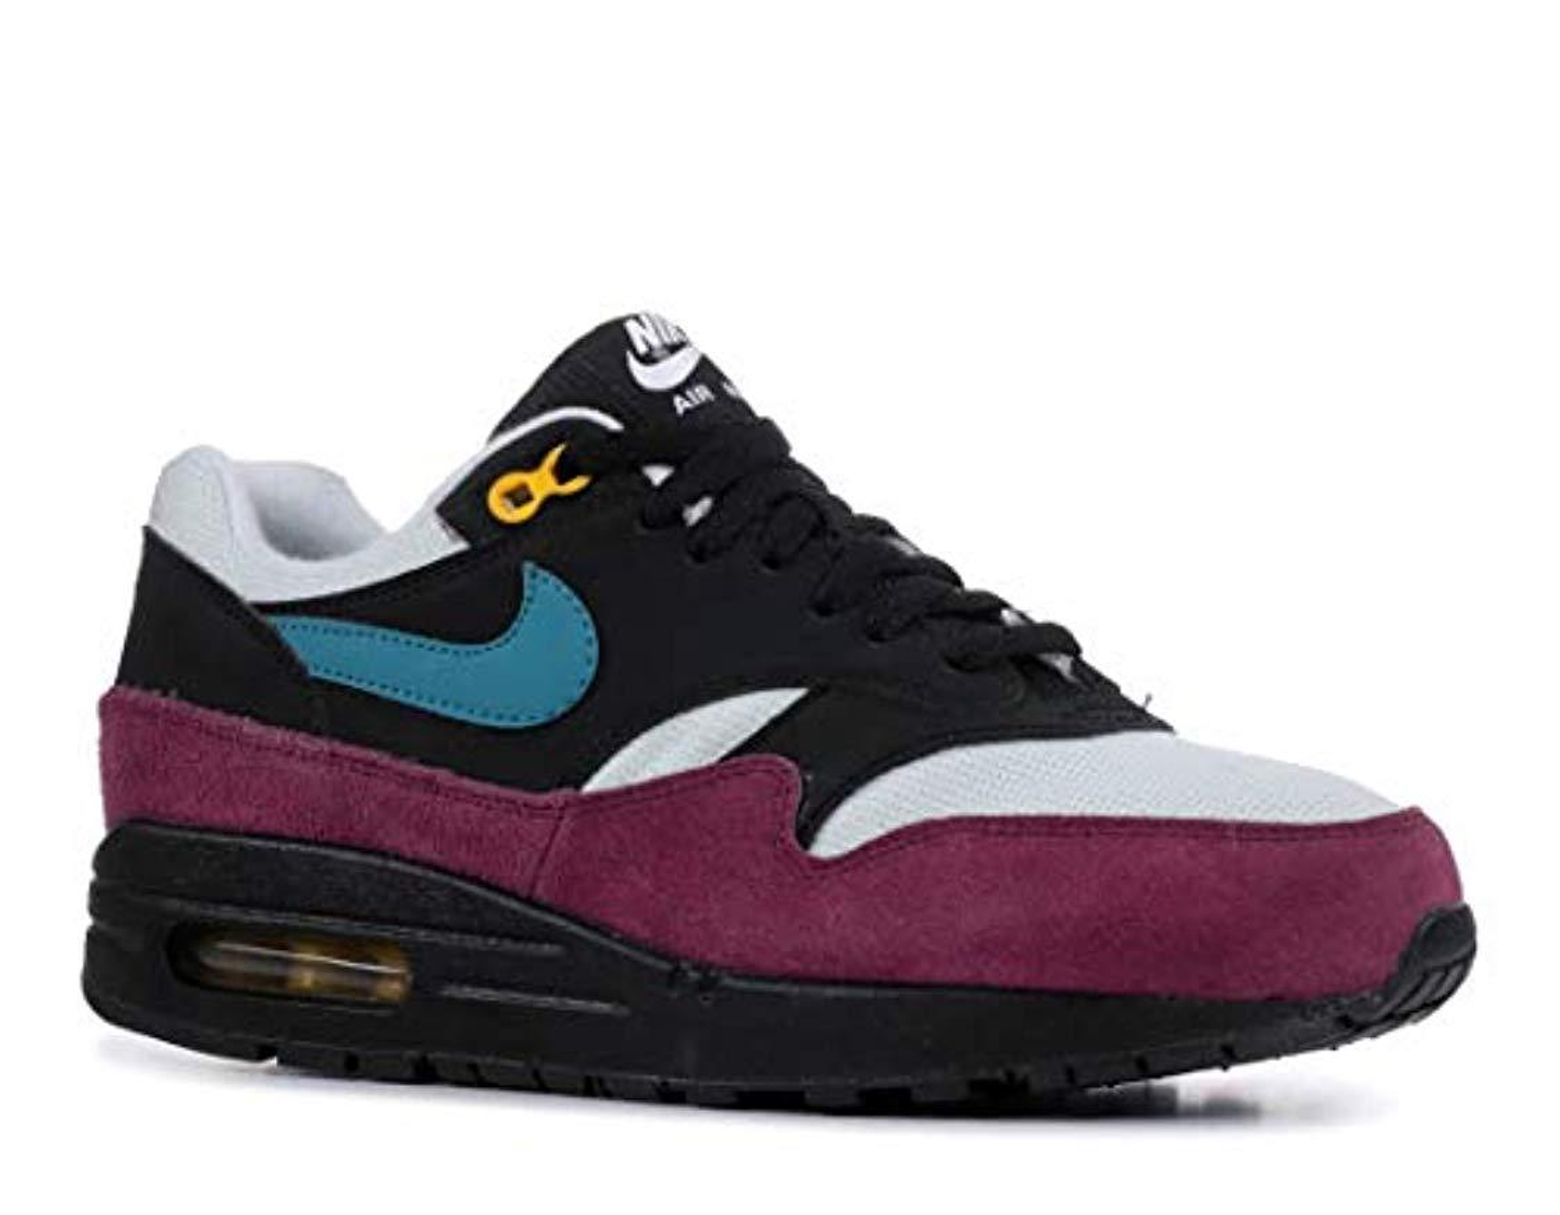 Nike Wmns Air Max 1 319986 040 in Black Lyst